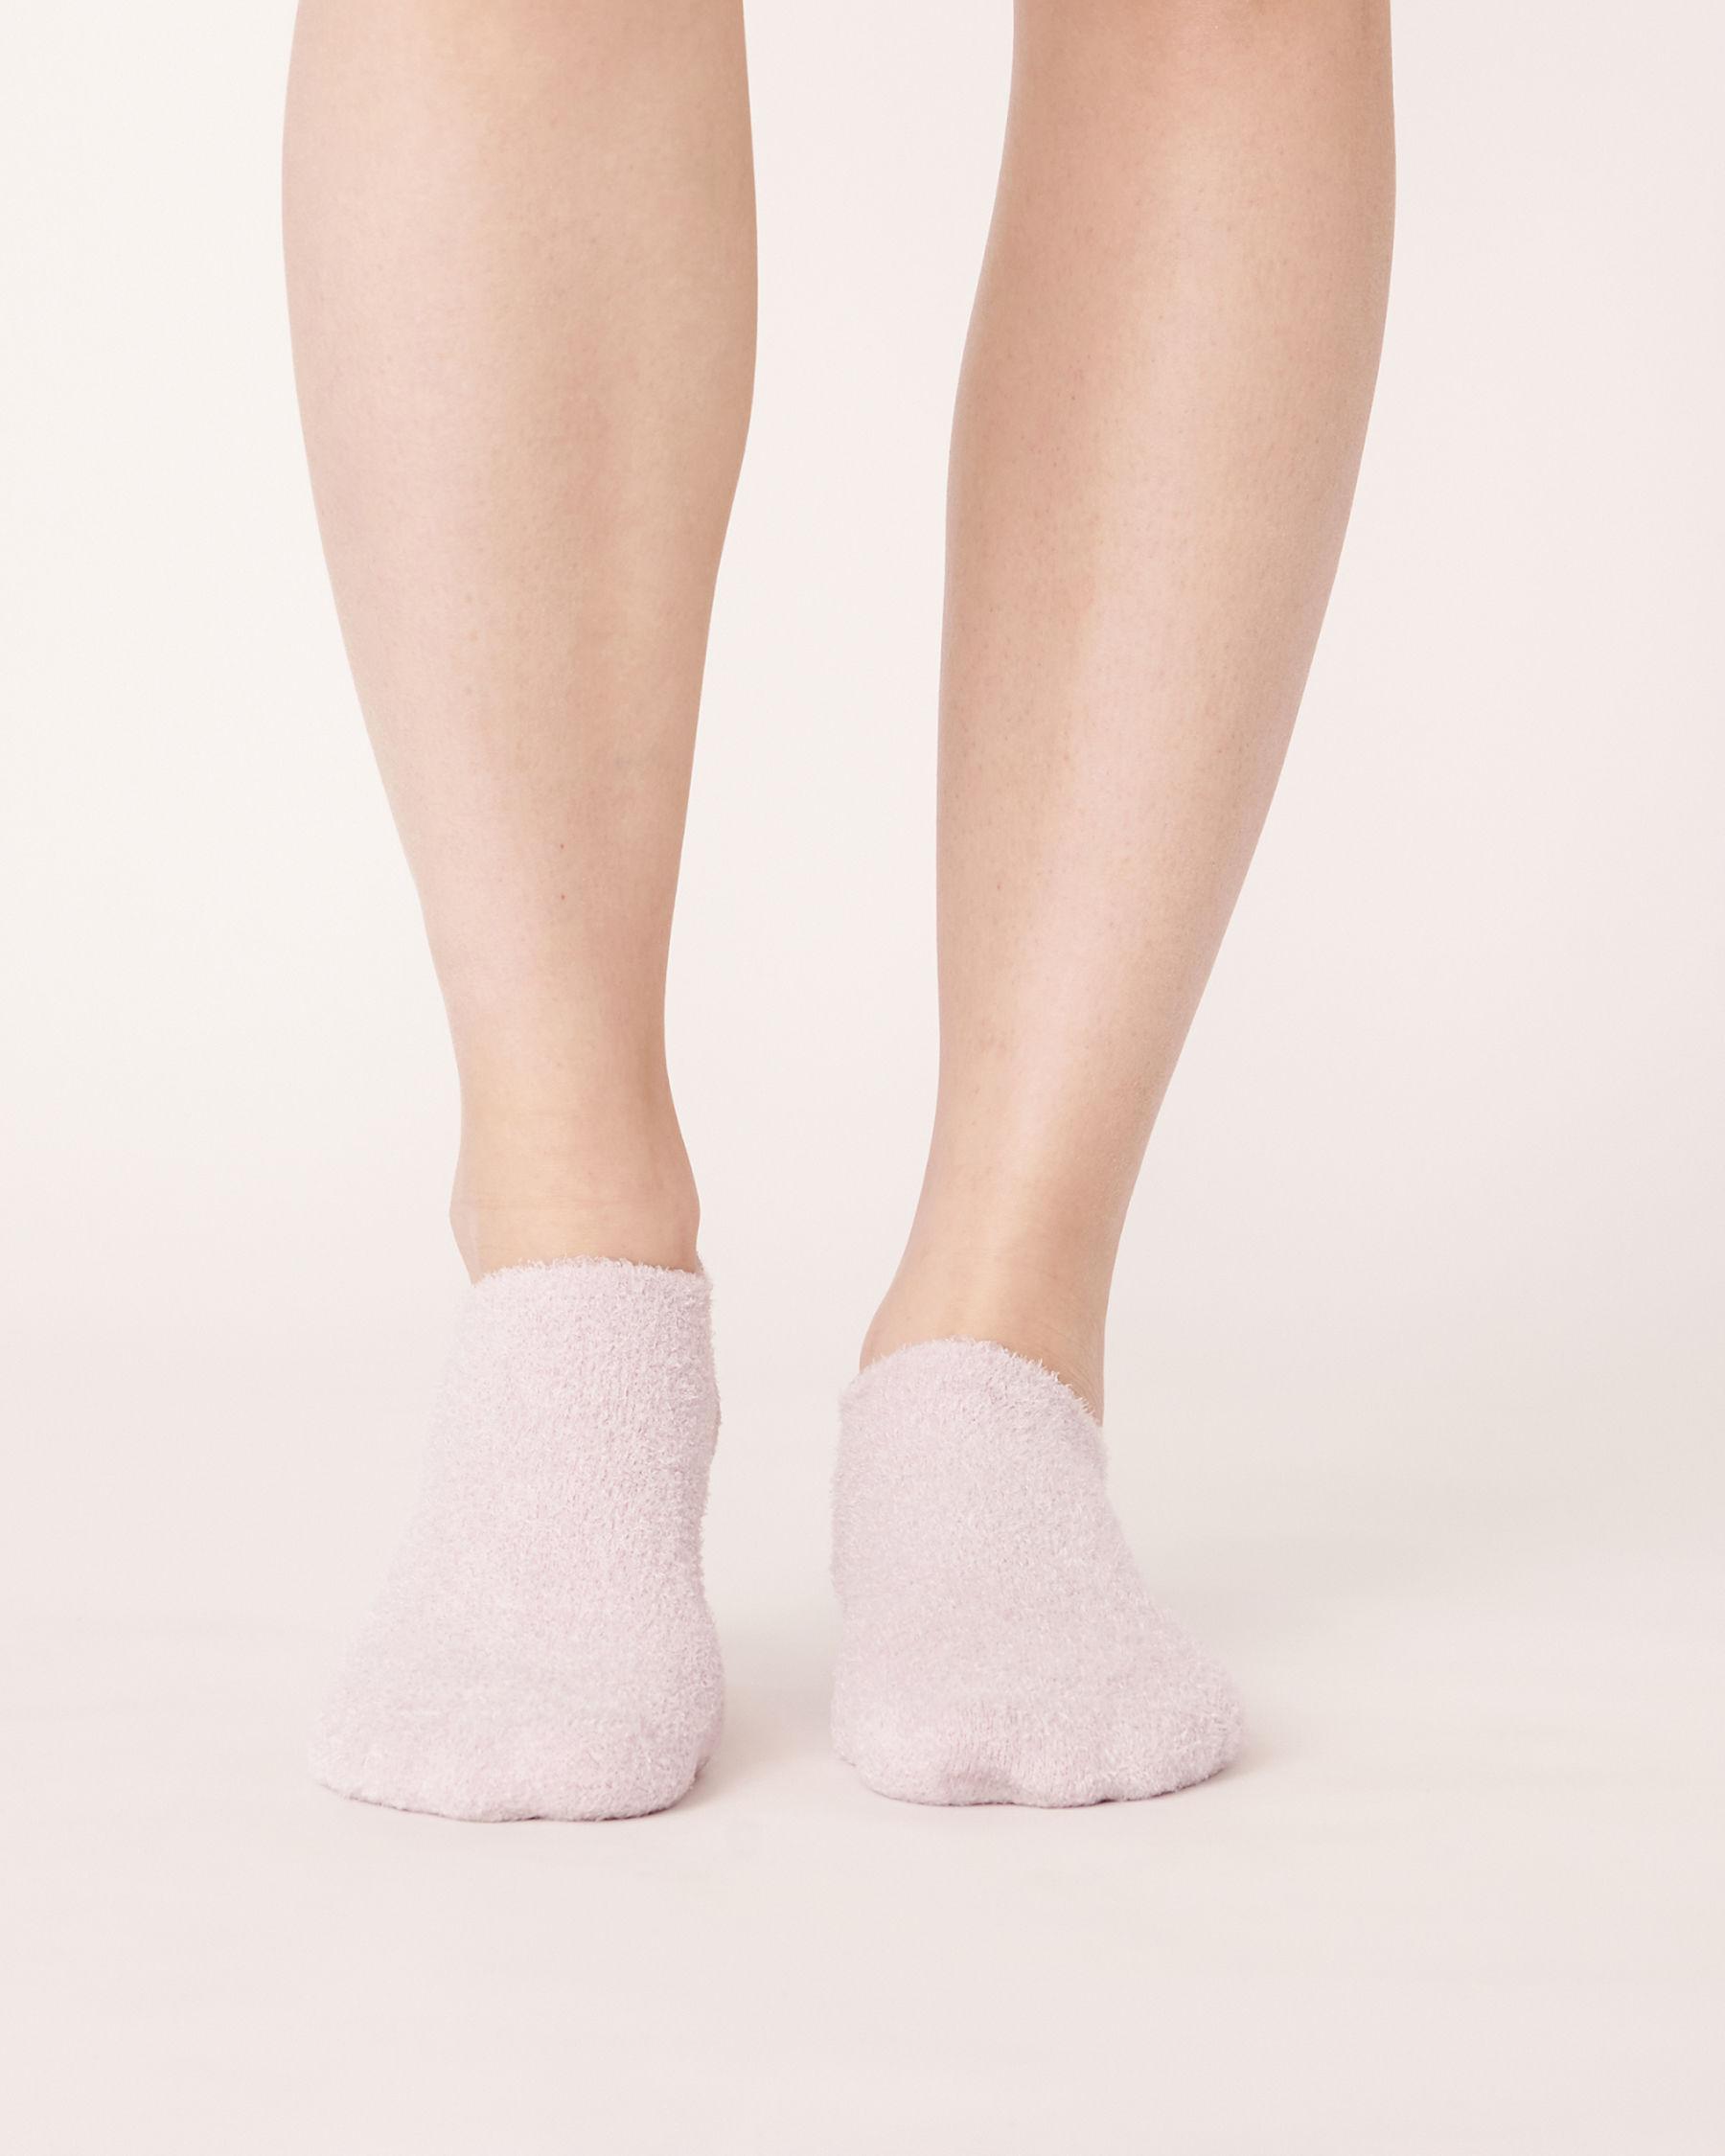 LA VIE EN ROSE Lavender Moisturizing Gel Socks Pale lilac 40700032 - View1